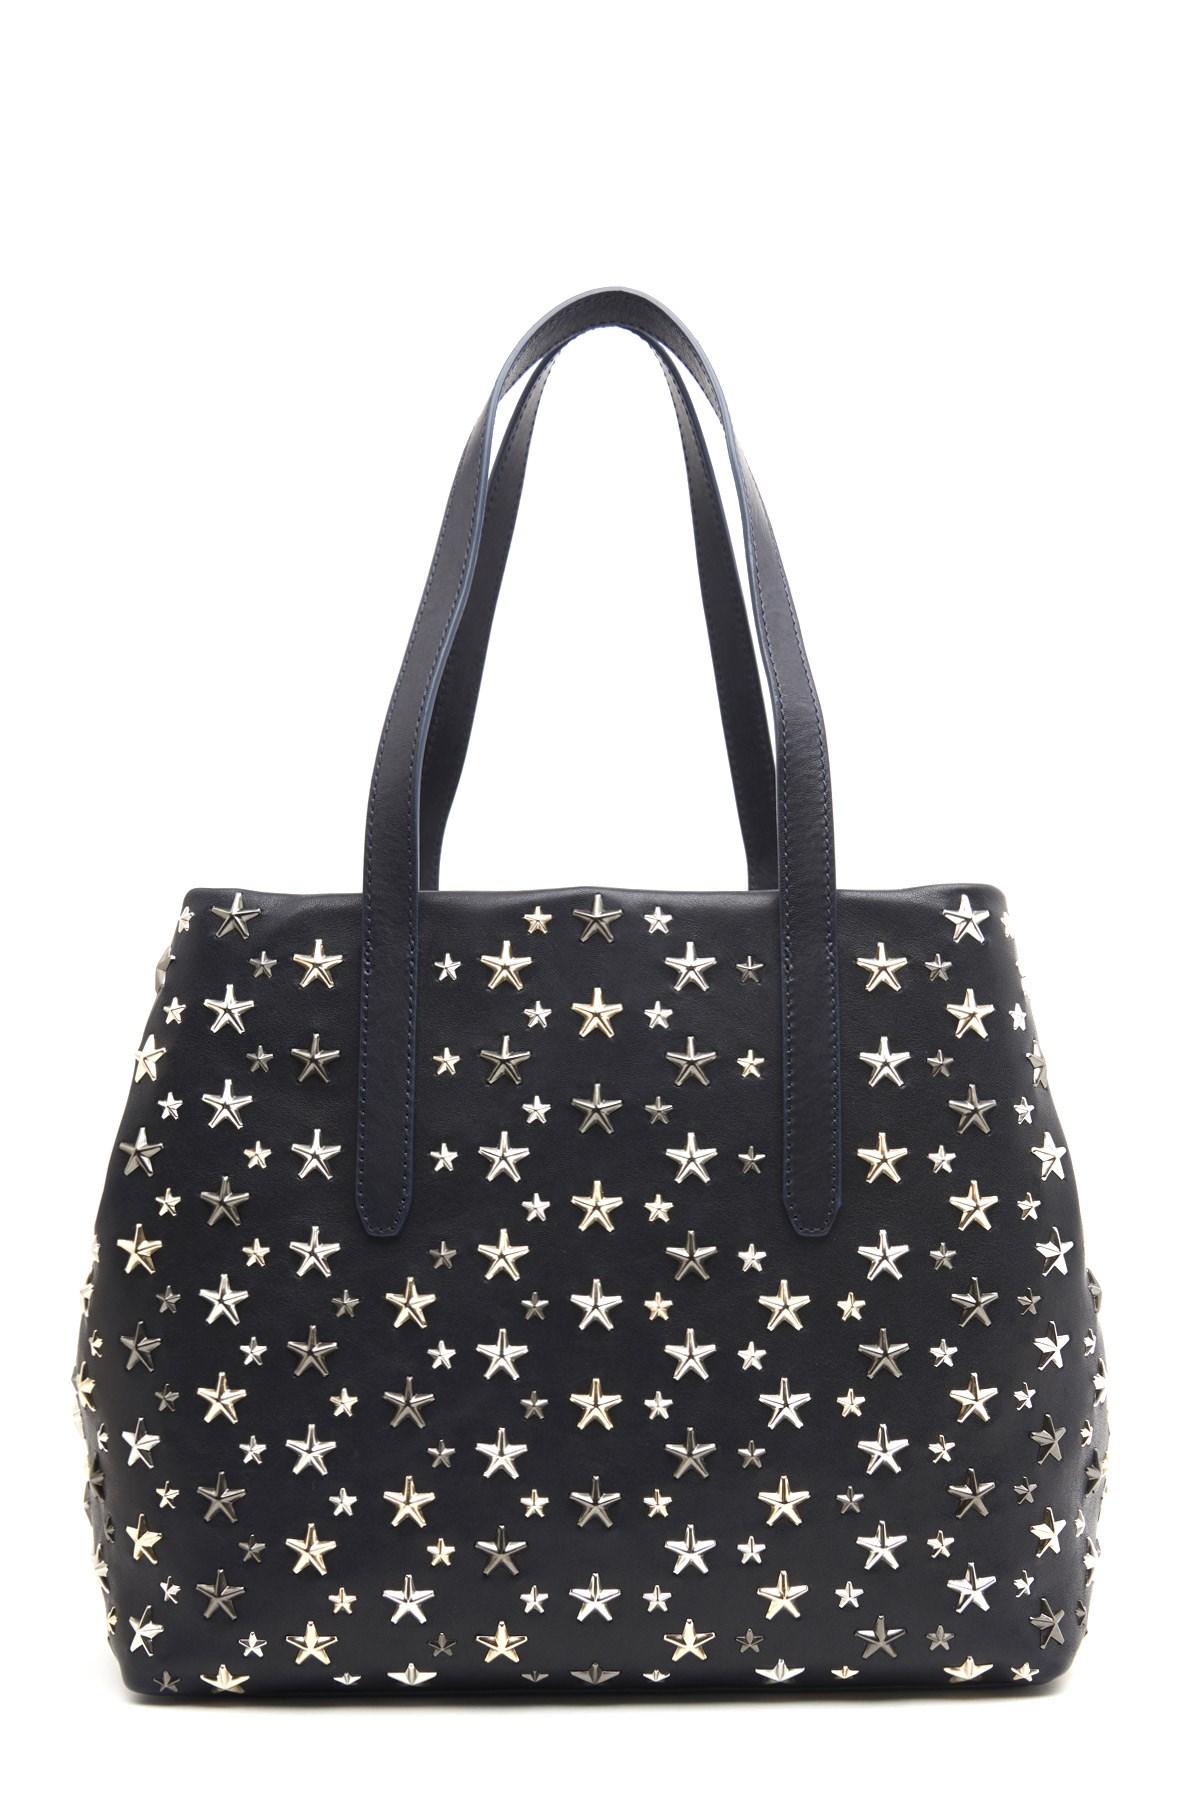 563204fe6d31 jimmy choo  sophia  hand bag available on julian-fashion.com - 60436